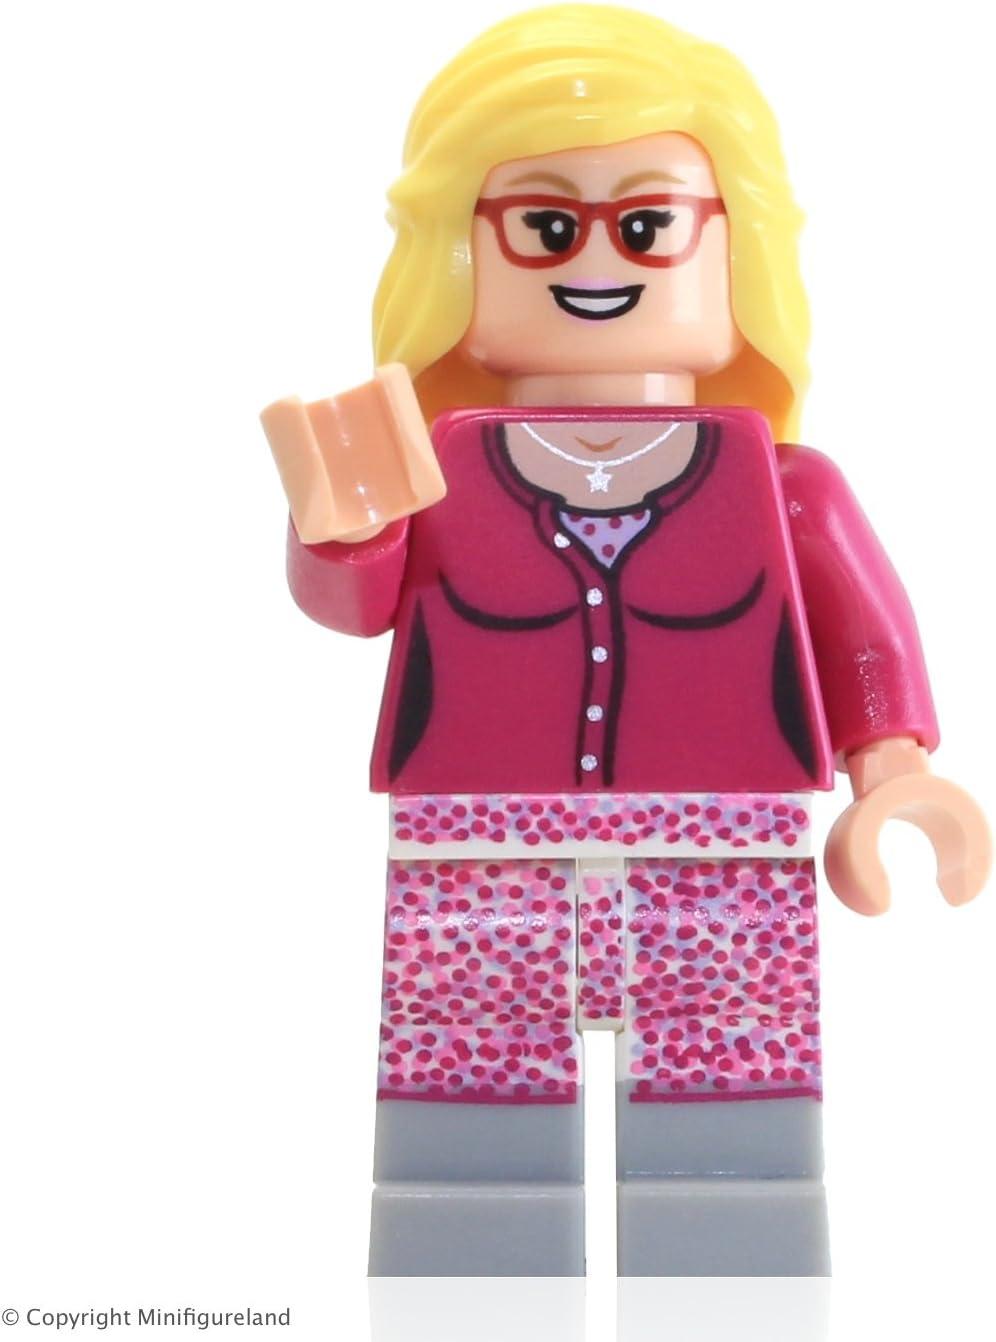 LEGO Ideas Big Bang Theory Minifigure - Bernadette (Exclusive 21302)